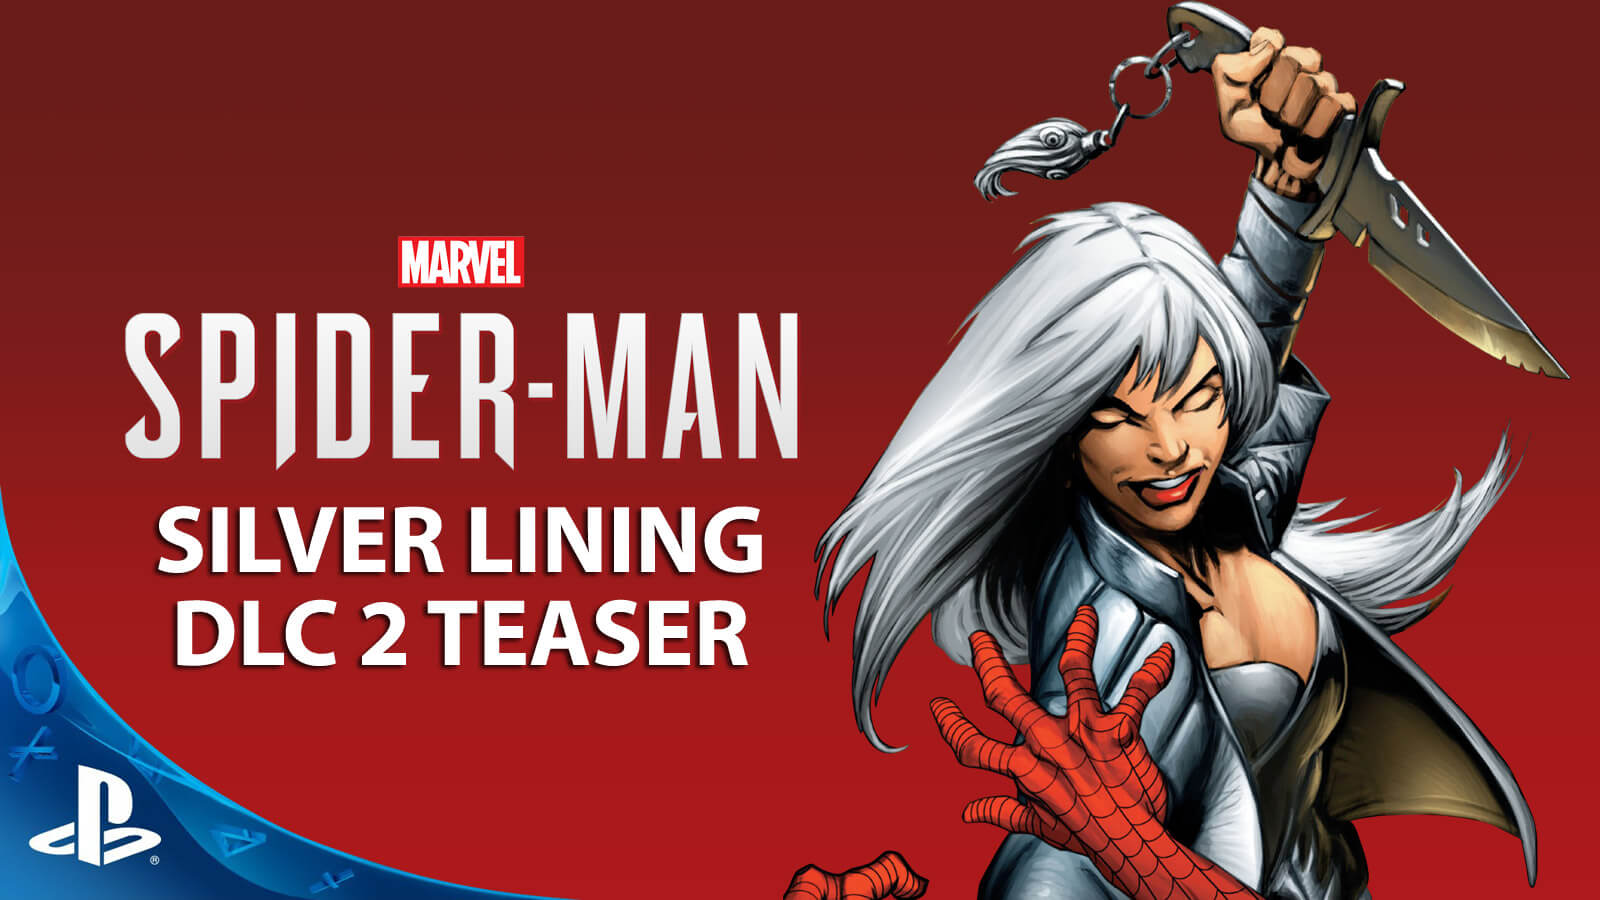 Marvel's Spider-Man: Silver Lining DLC 3 Teaser - Gameslaught